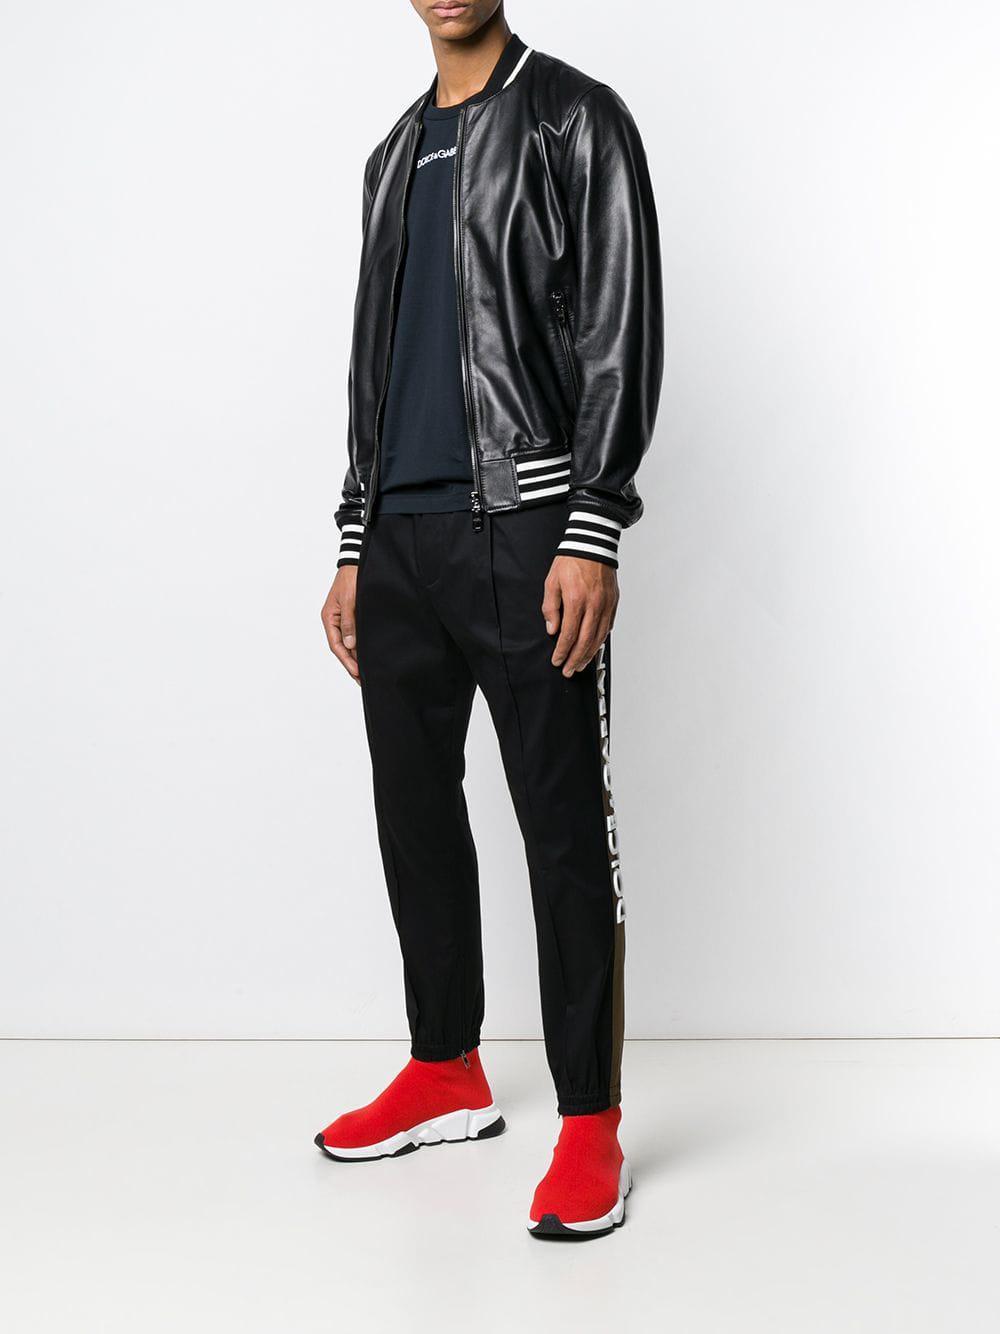 6306f2d8 Lyst - Dolce & Gabbana Logo Trim Sweatpants in Black for Men